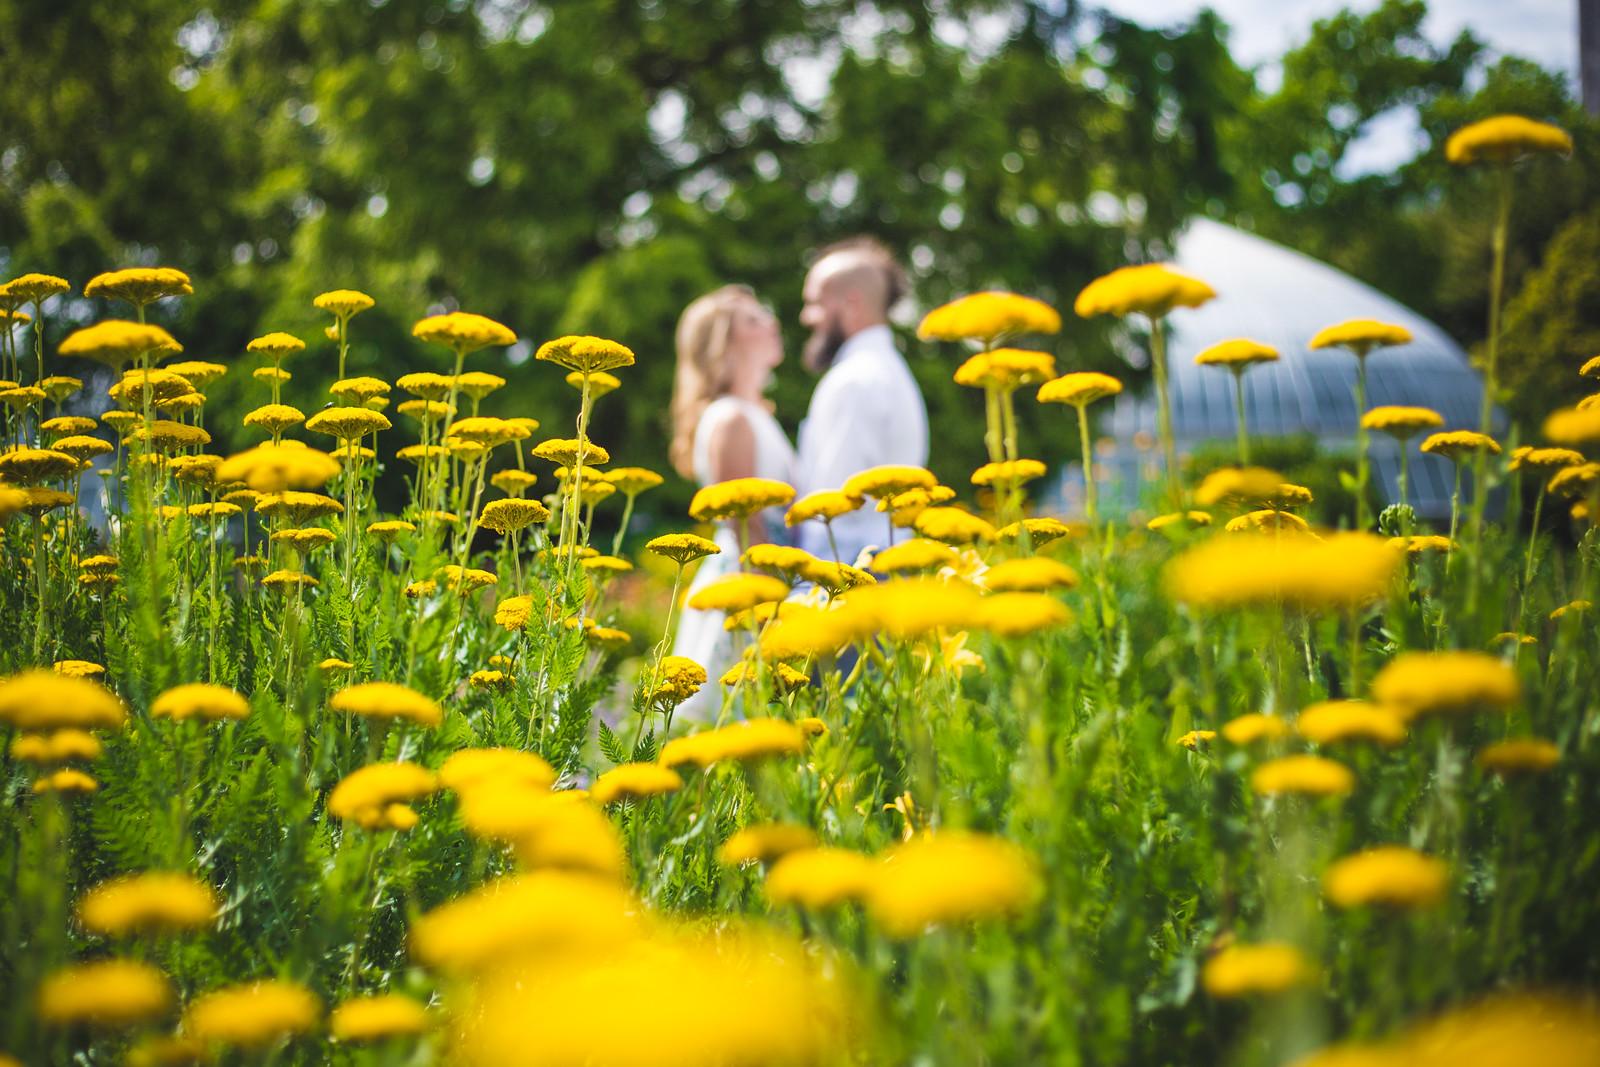 phipps-conservatory-botanical-garden-outdoor-garden-engagement-shoot-pittsburgh-manny-photographer-1